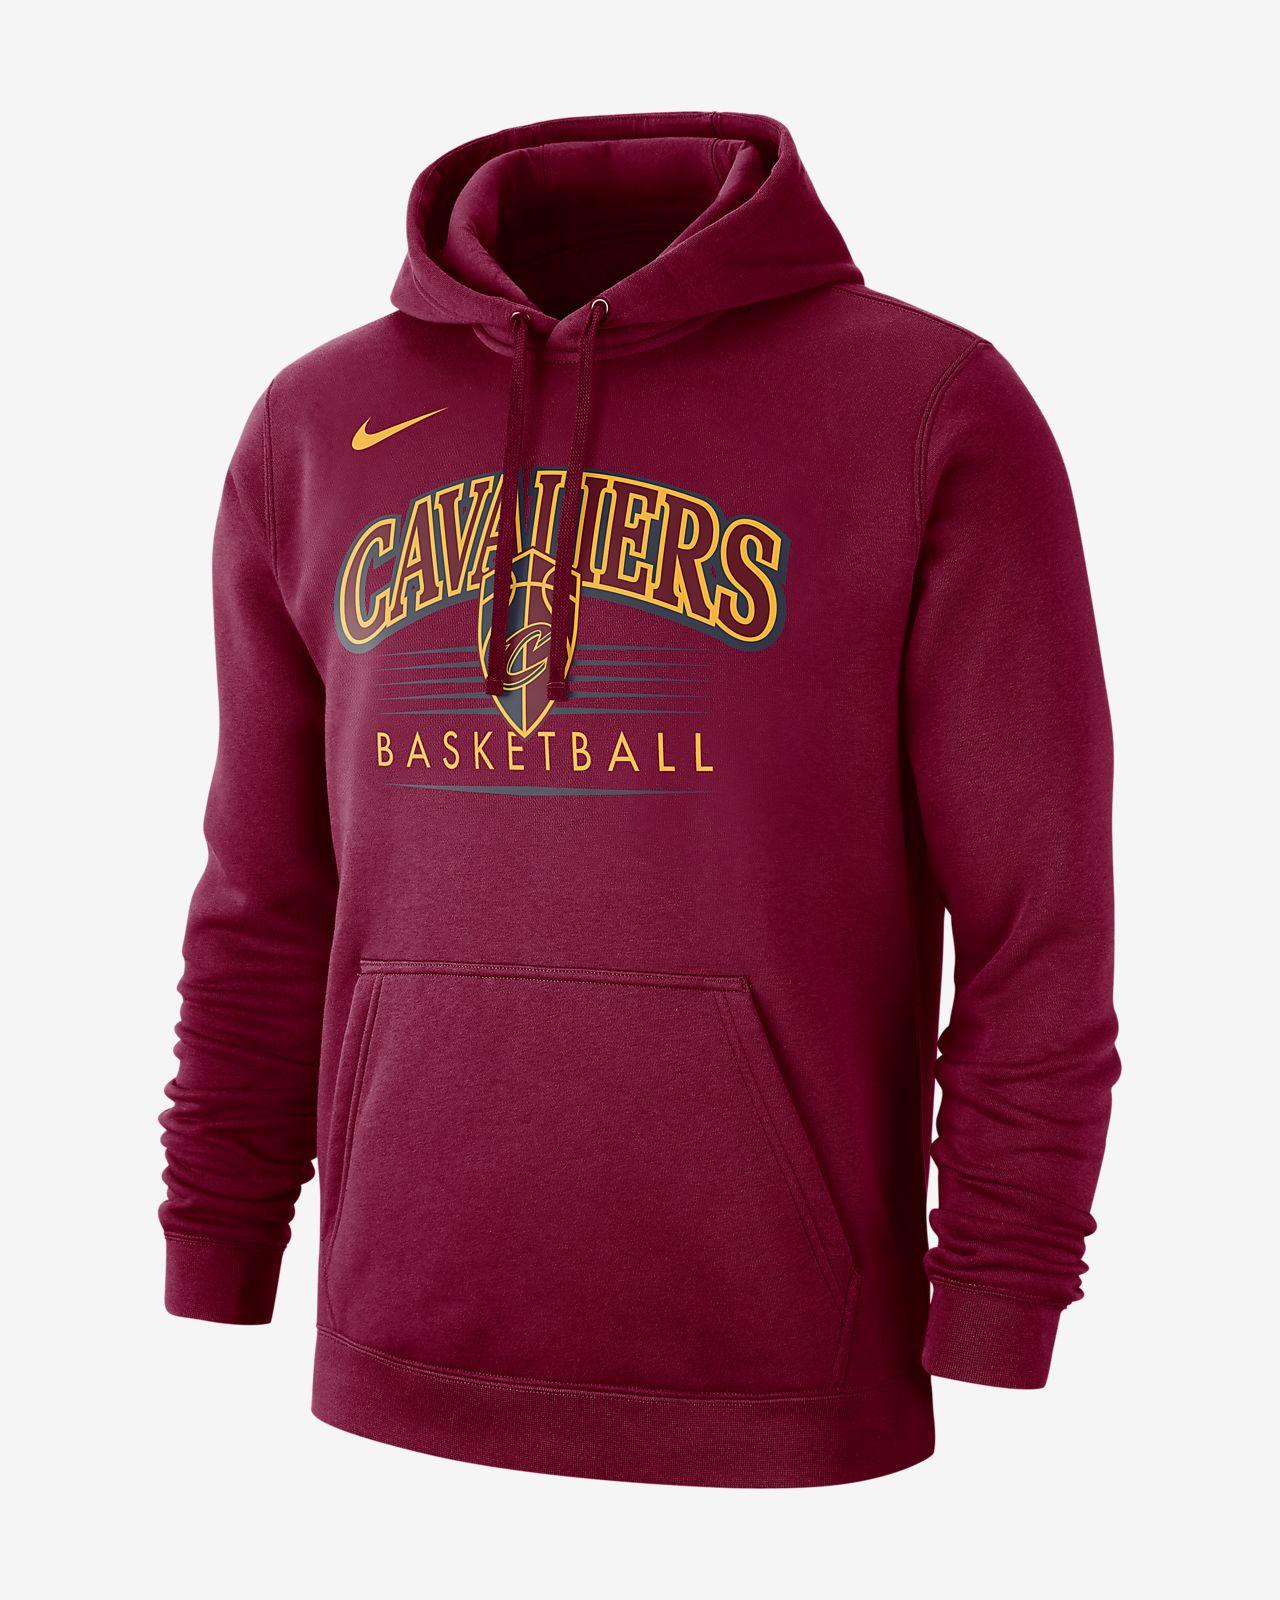 d360d6f6c81e Cleveland Cavaliers Nike Men s NBA Hoodie. Nike.com